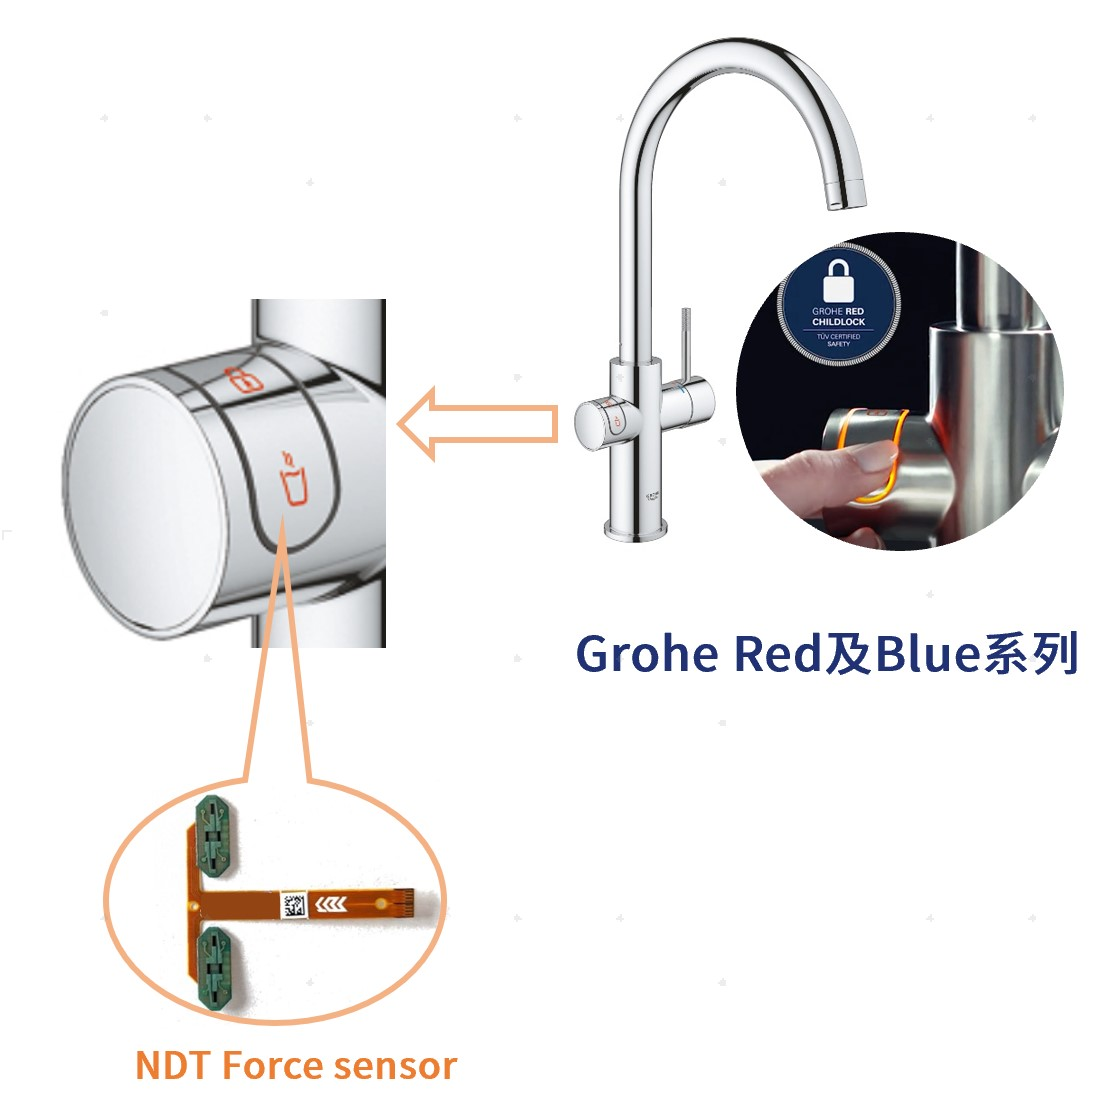 NDT推出通用型Micro Single Key压感触控方案,赋能广泛IoT终端交互